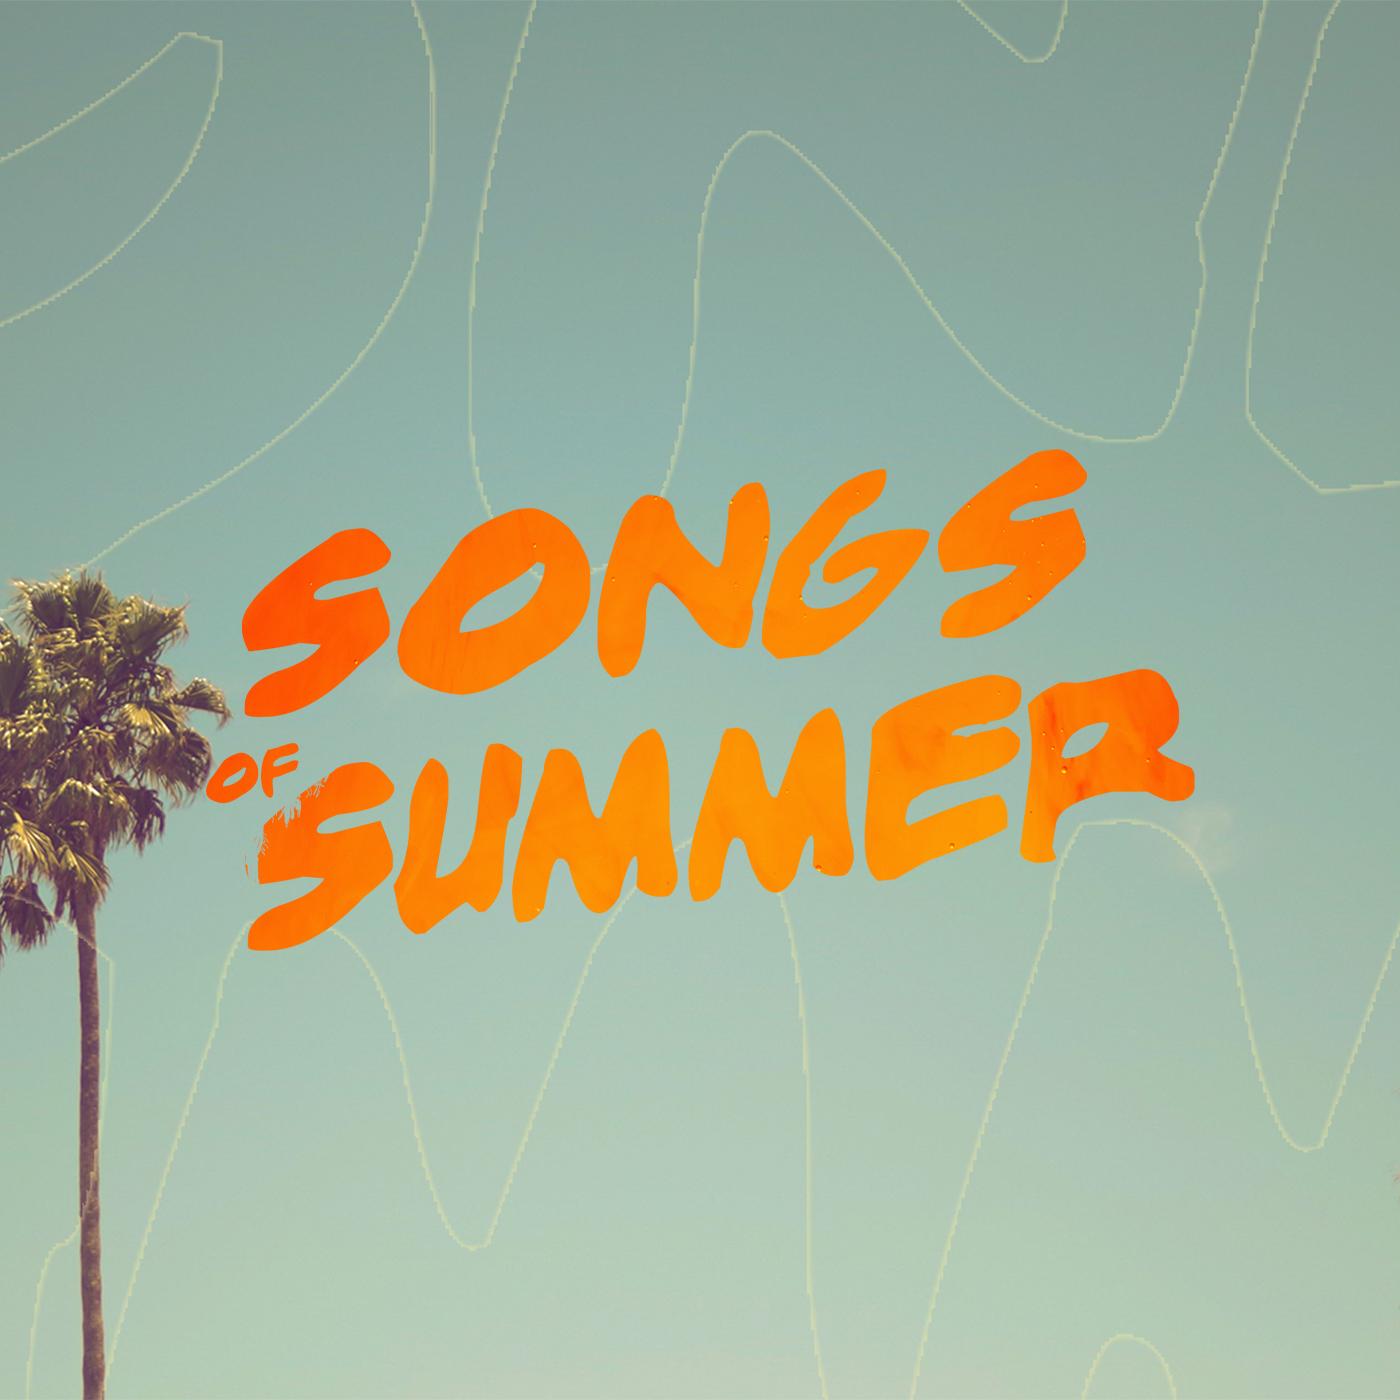 Songs of Summer Square Image.jpg